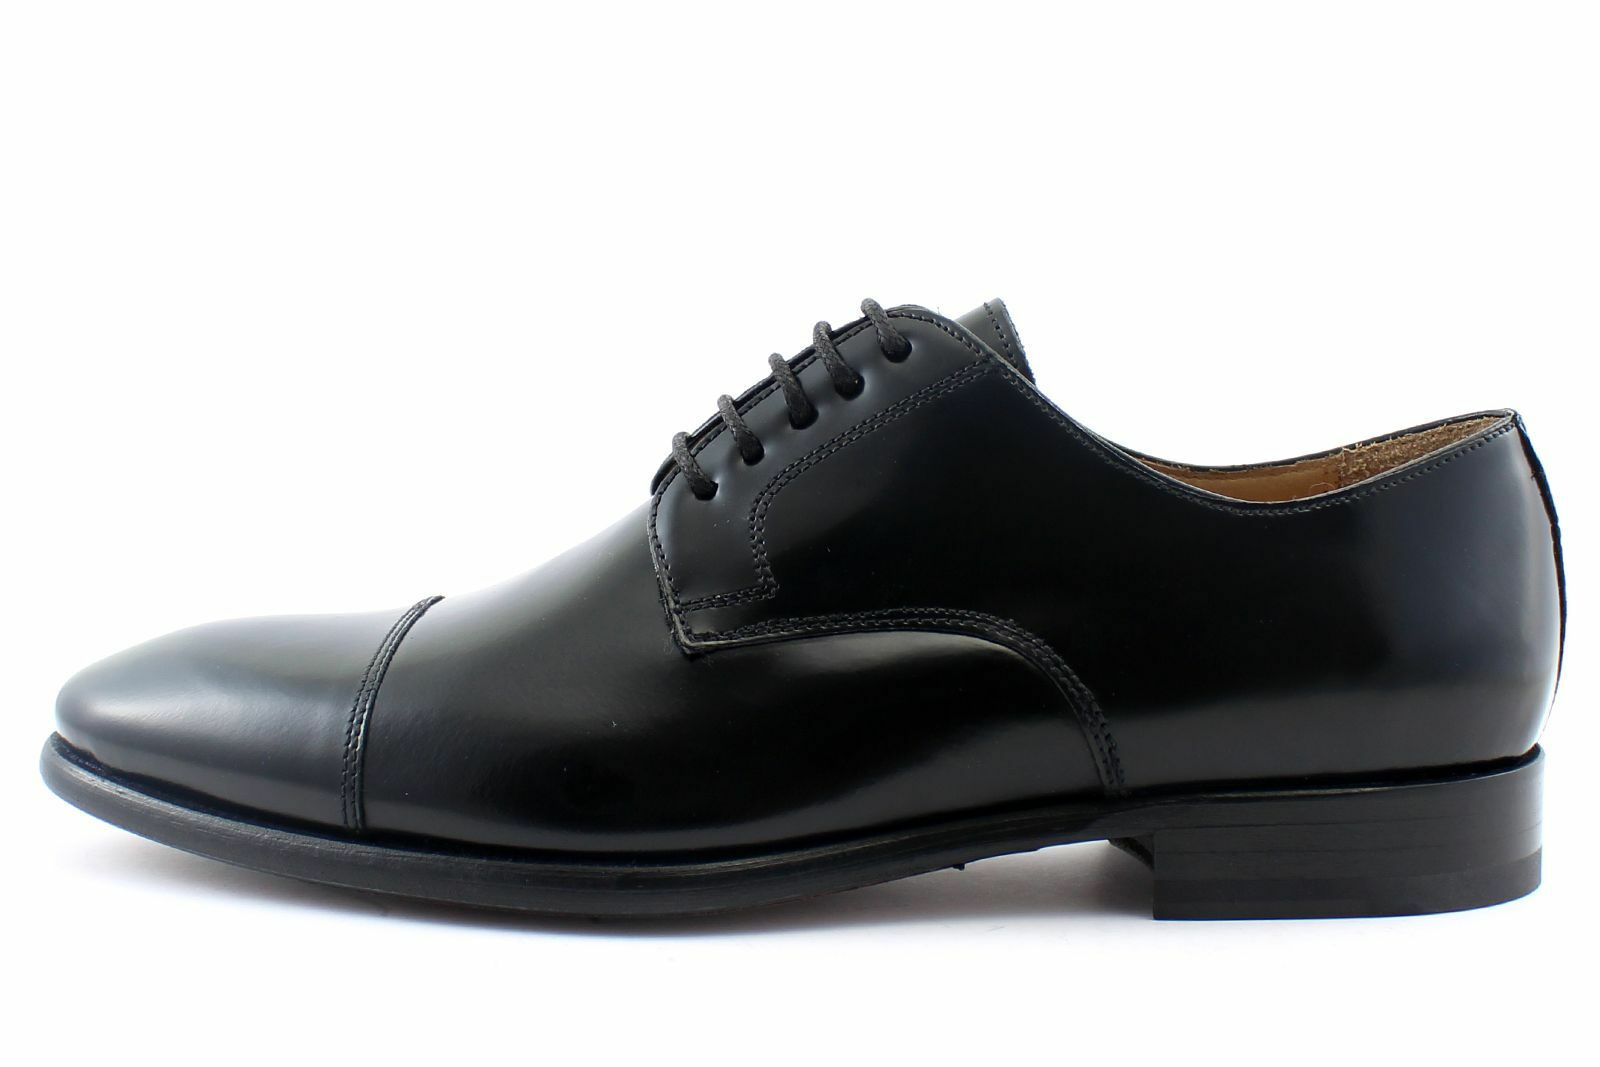 Uomo shoes leather Italian Giorgio Rea   7 7 7 8 9 10 11 12 dress oxford 07358NE b07dc8